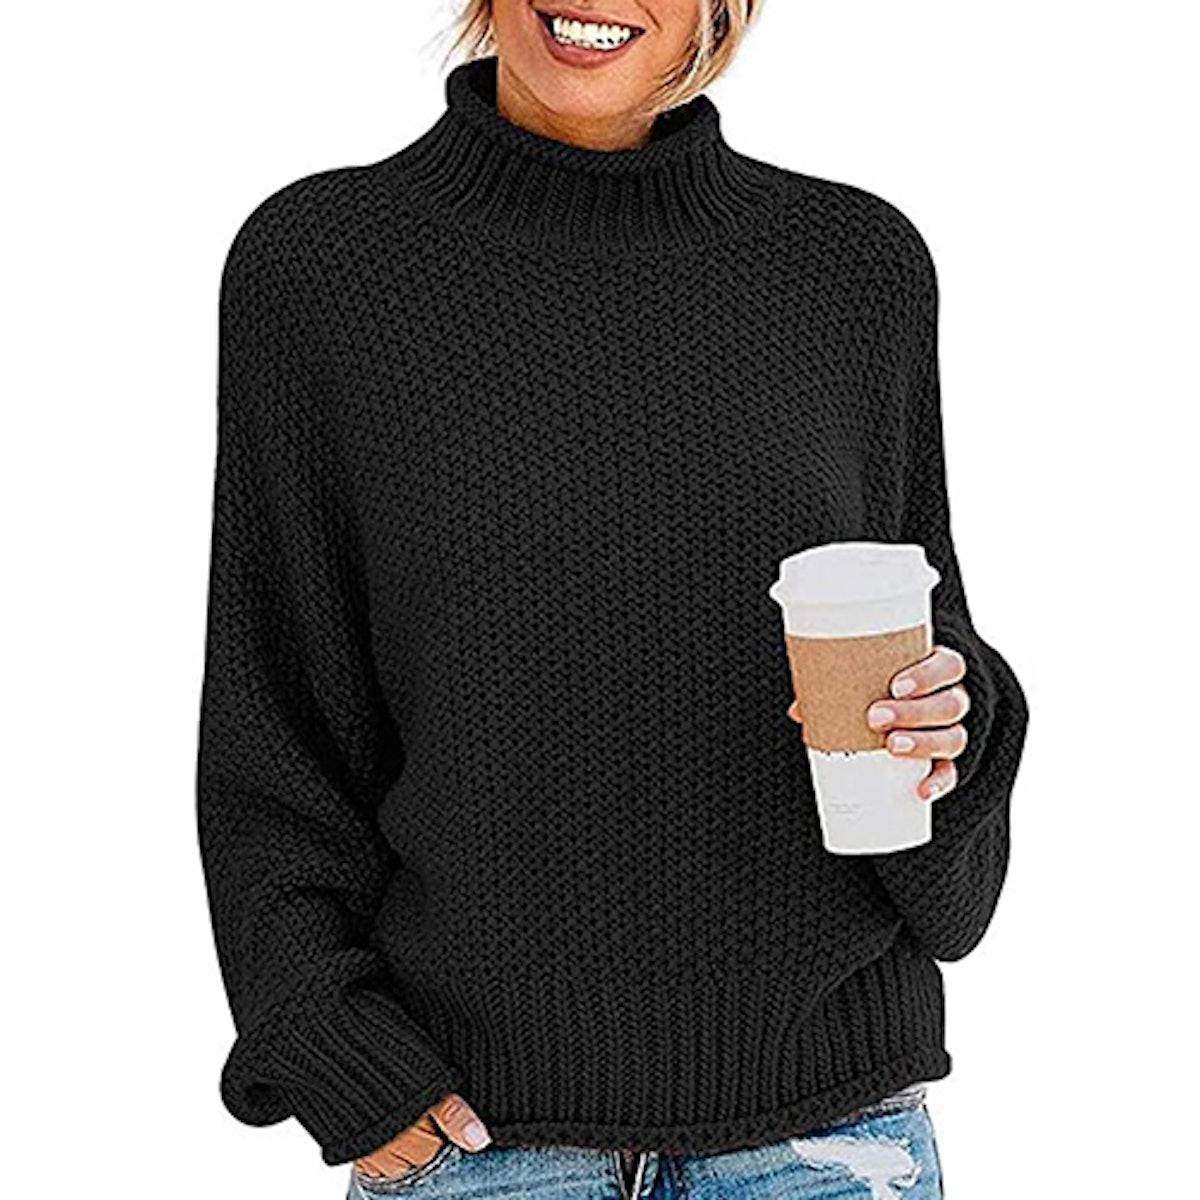 ZESICA Oversized Turtleneck Sweater